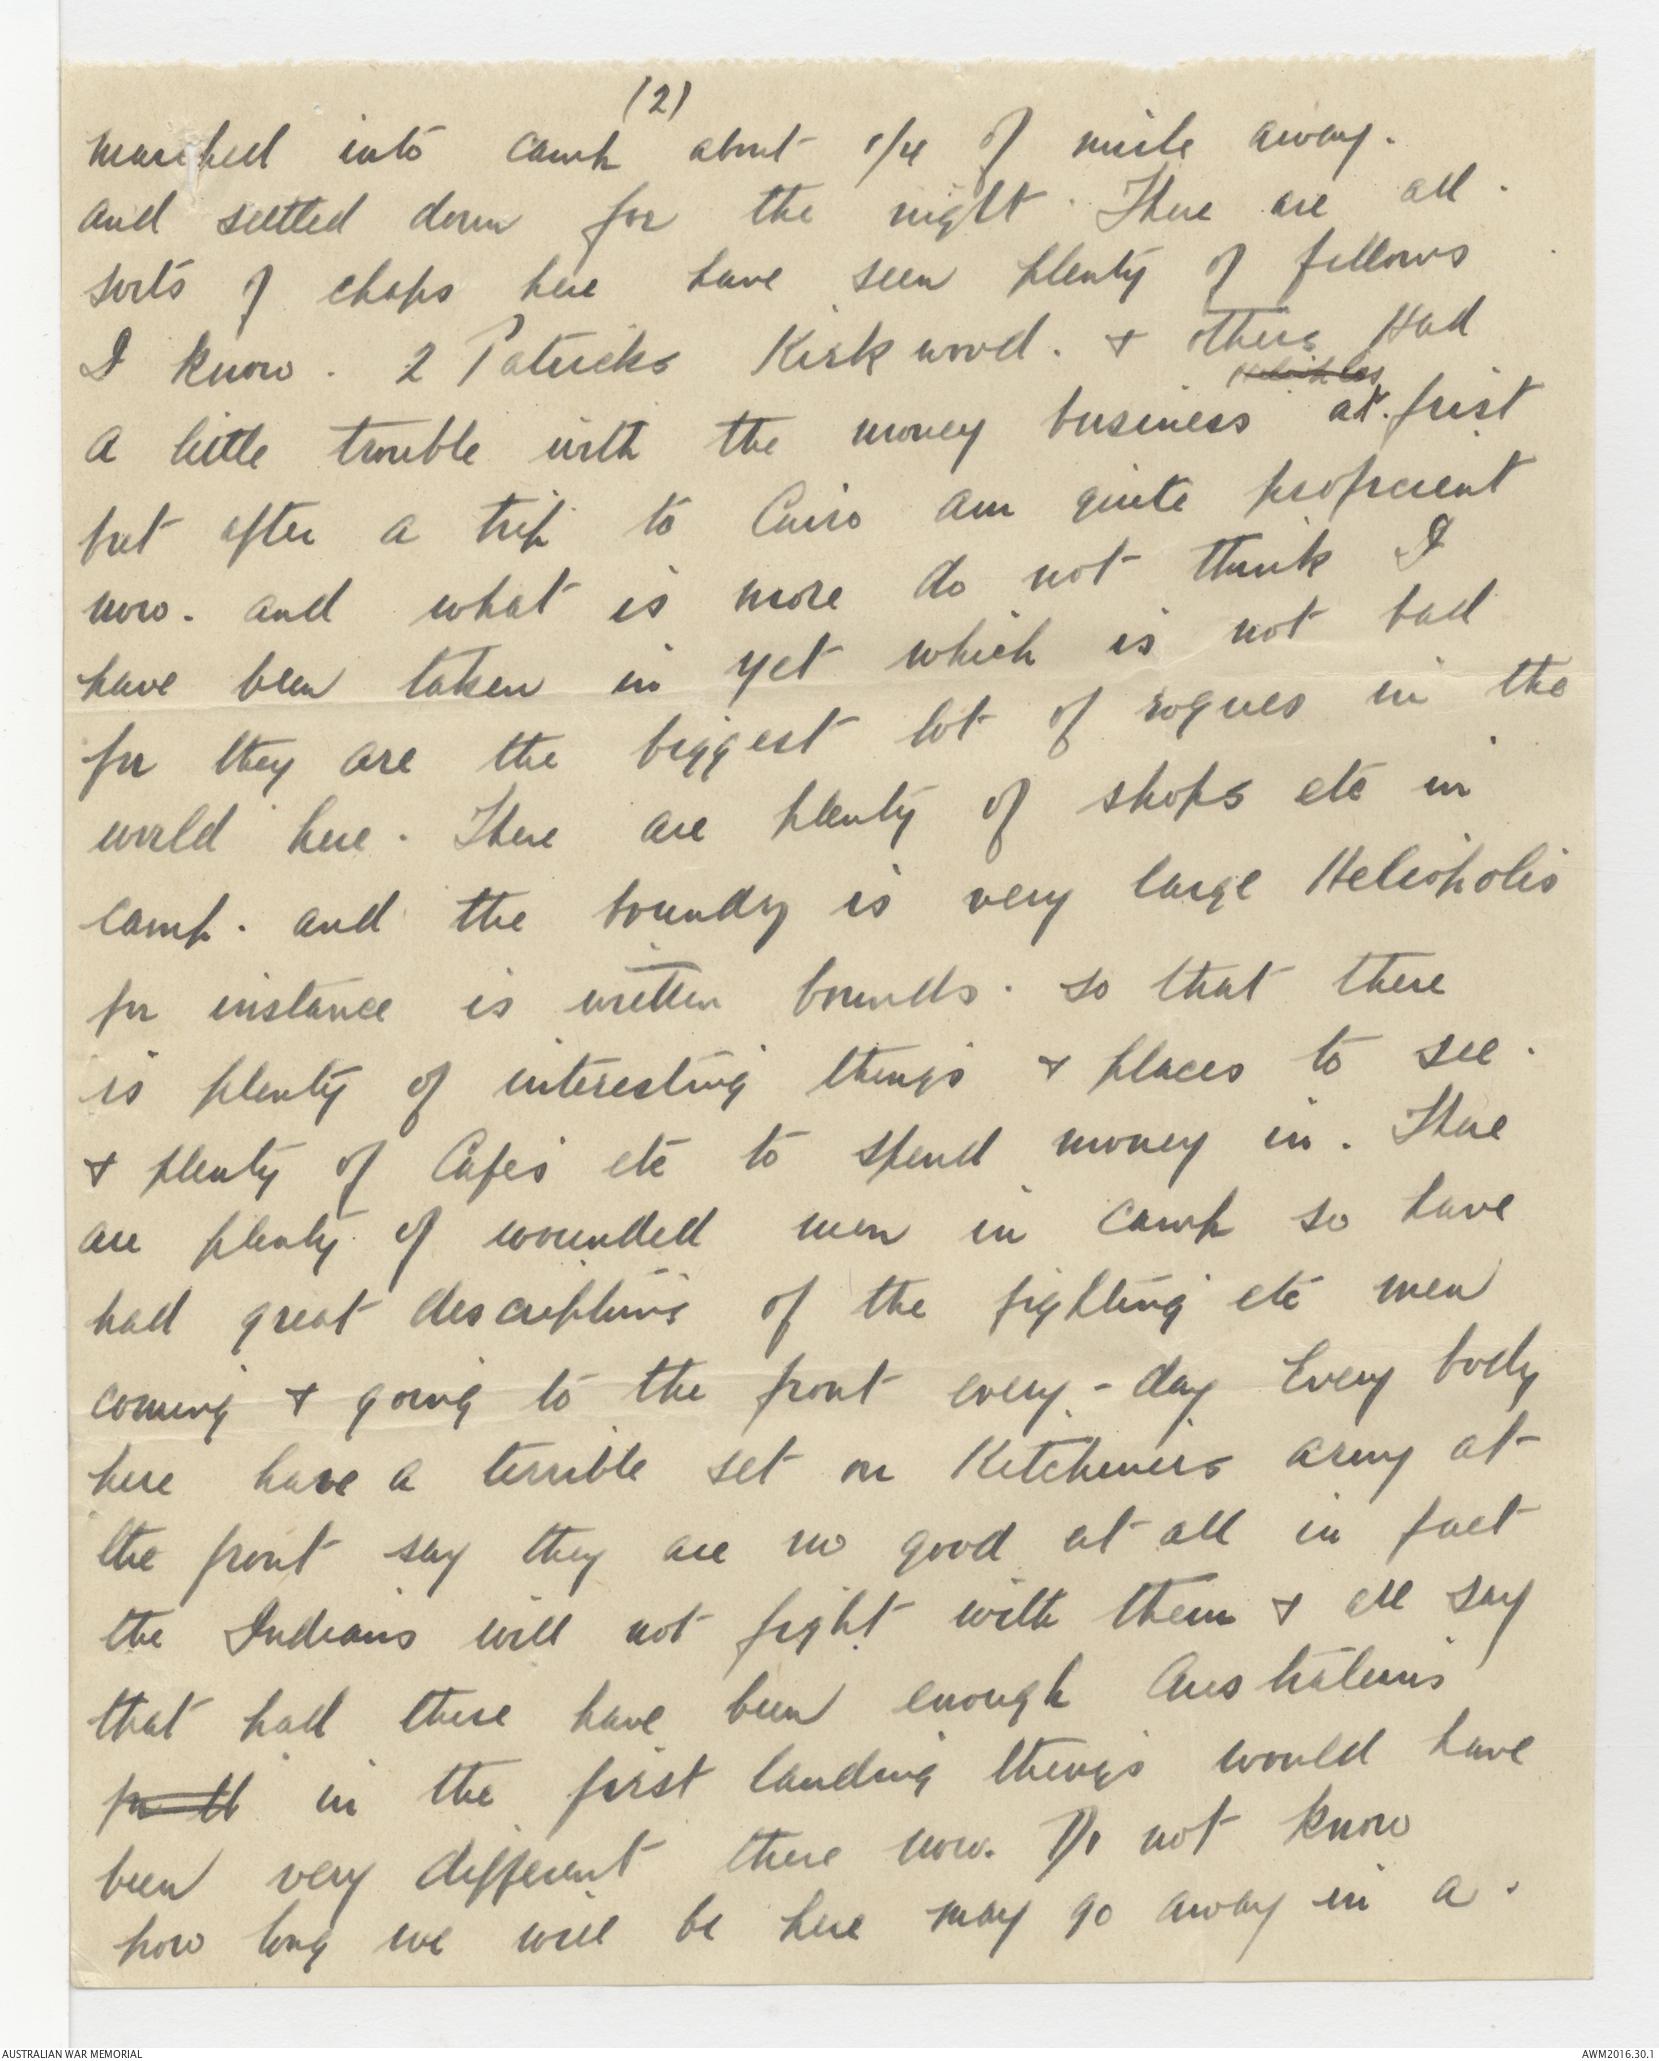 Letters from robert james henderson 1915 the australian war memorial enlarge spiritdancerdesigns Gallery